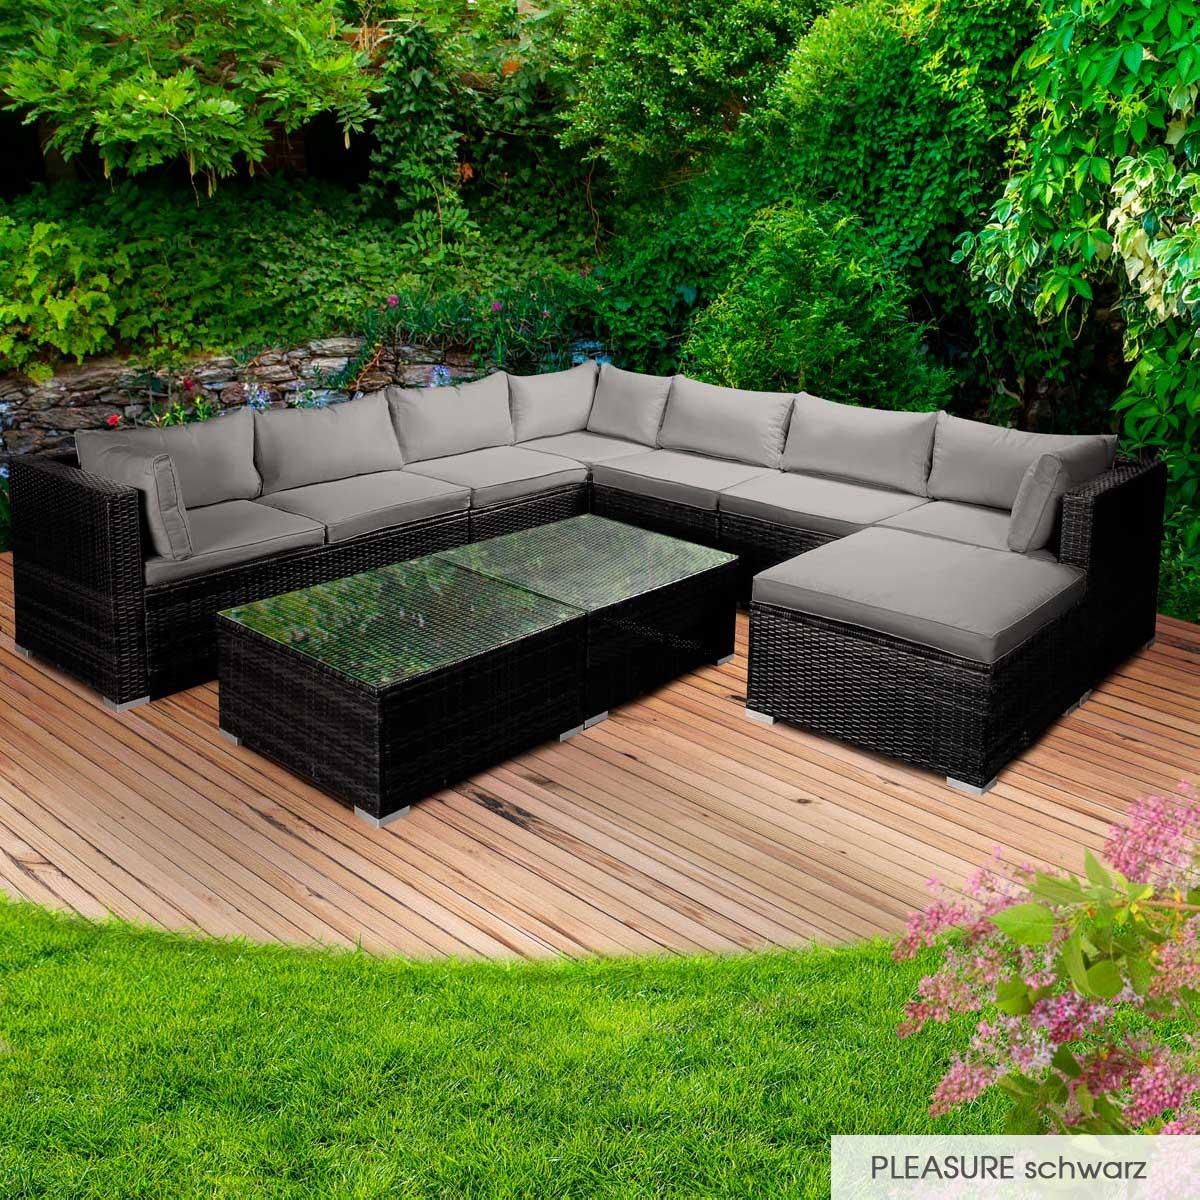 Gartenmoebel-Poly-Rattan-Lounge-Moebel-Sitzgarnitur-Gartengarnitur-Sitzgruppe-Sofa Indexbild 43